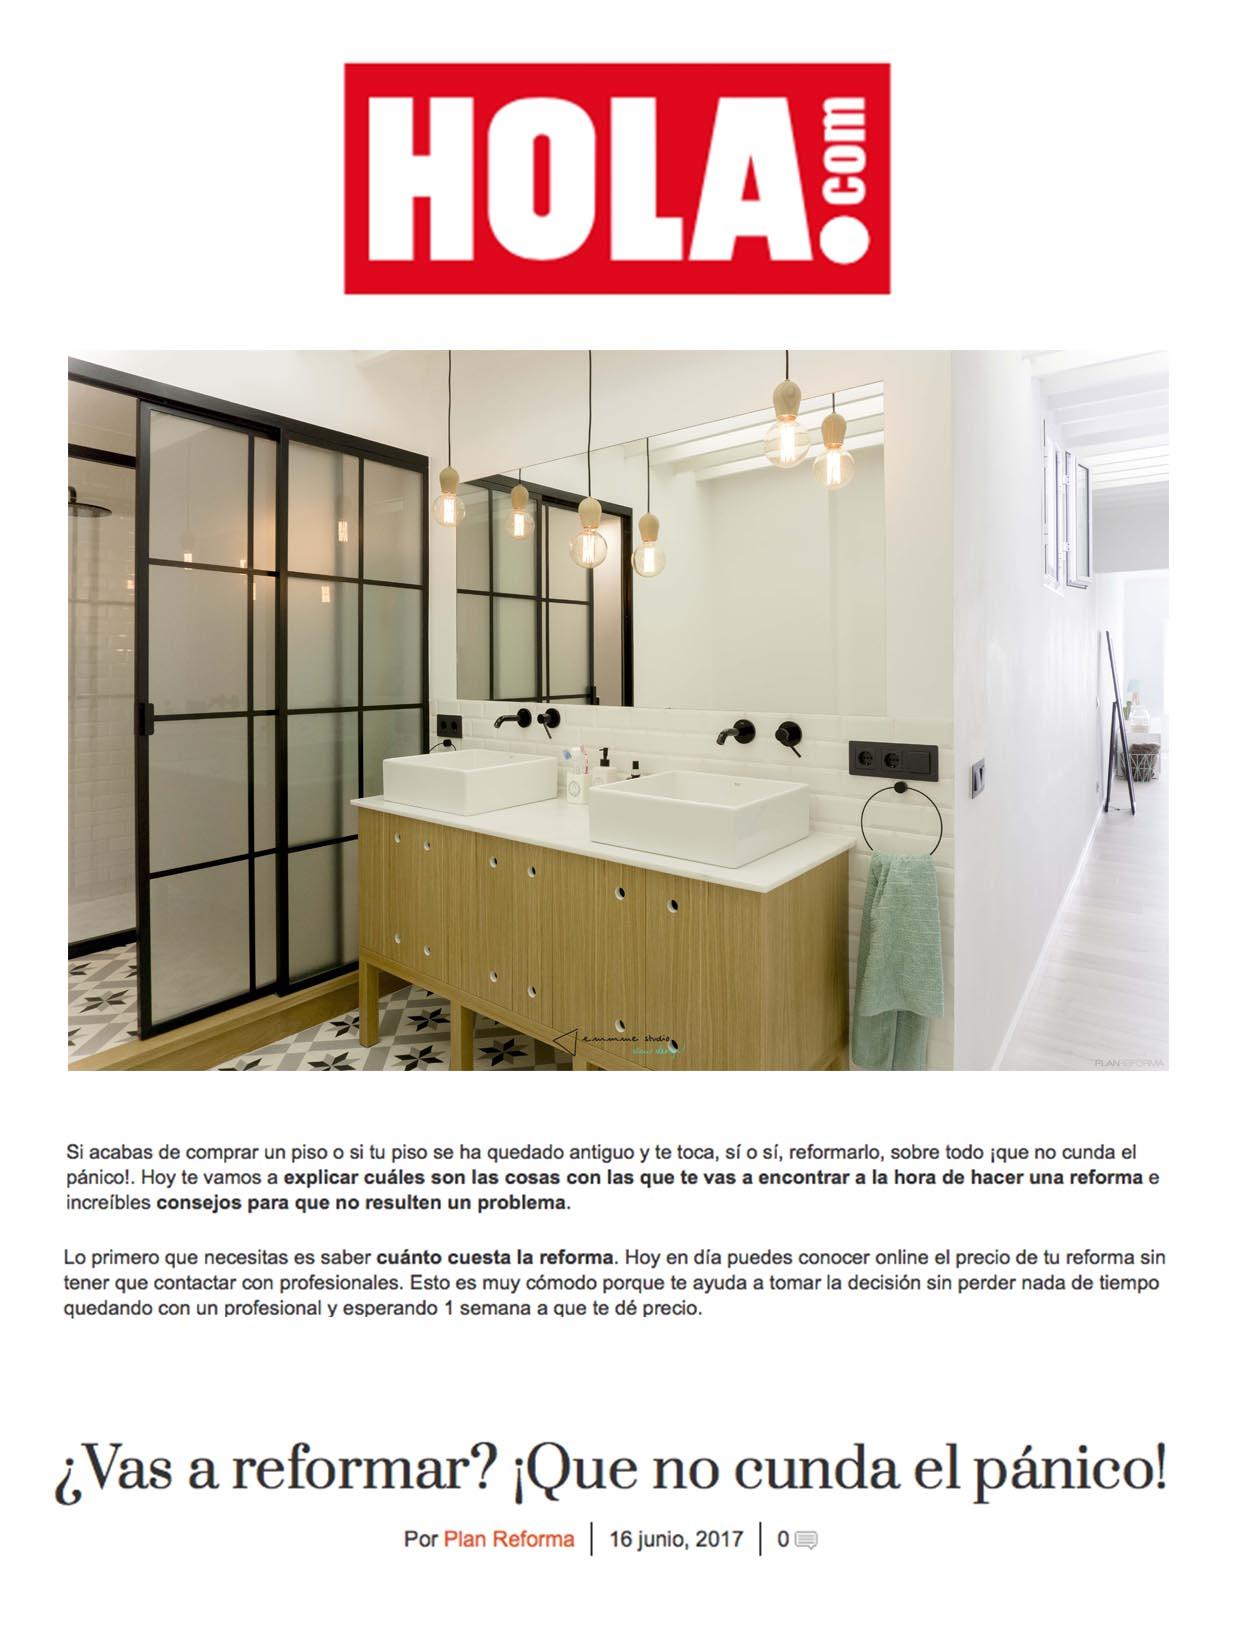 emmme studio hola lifestyle reformas diseño slow prensa vivienda laura y pedro.jpg